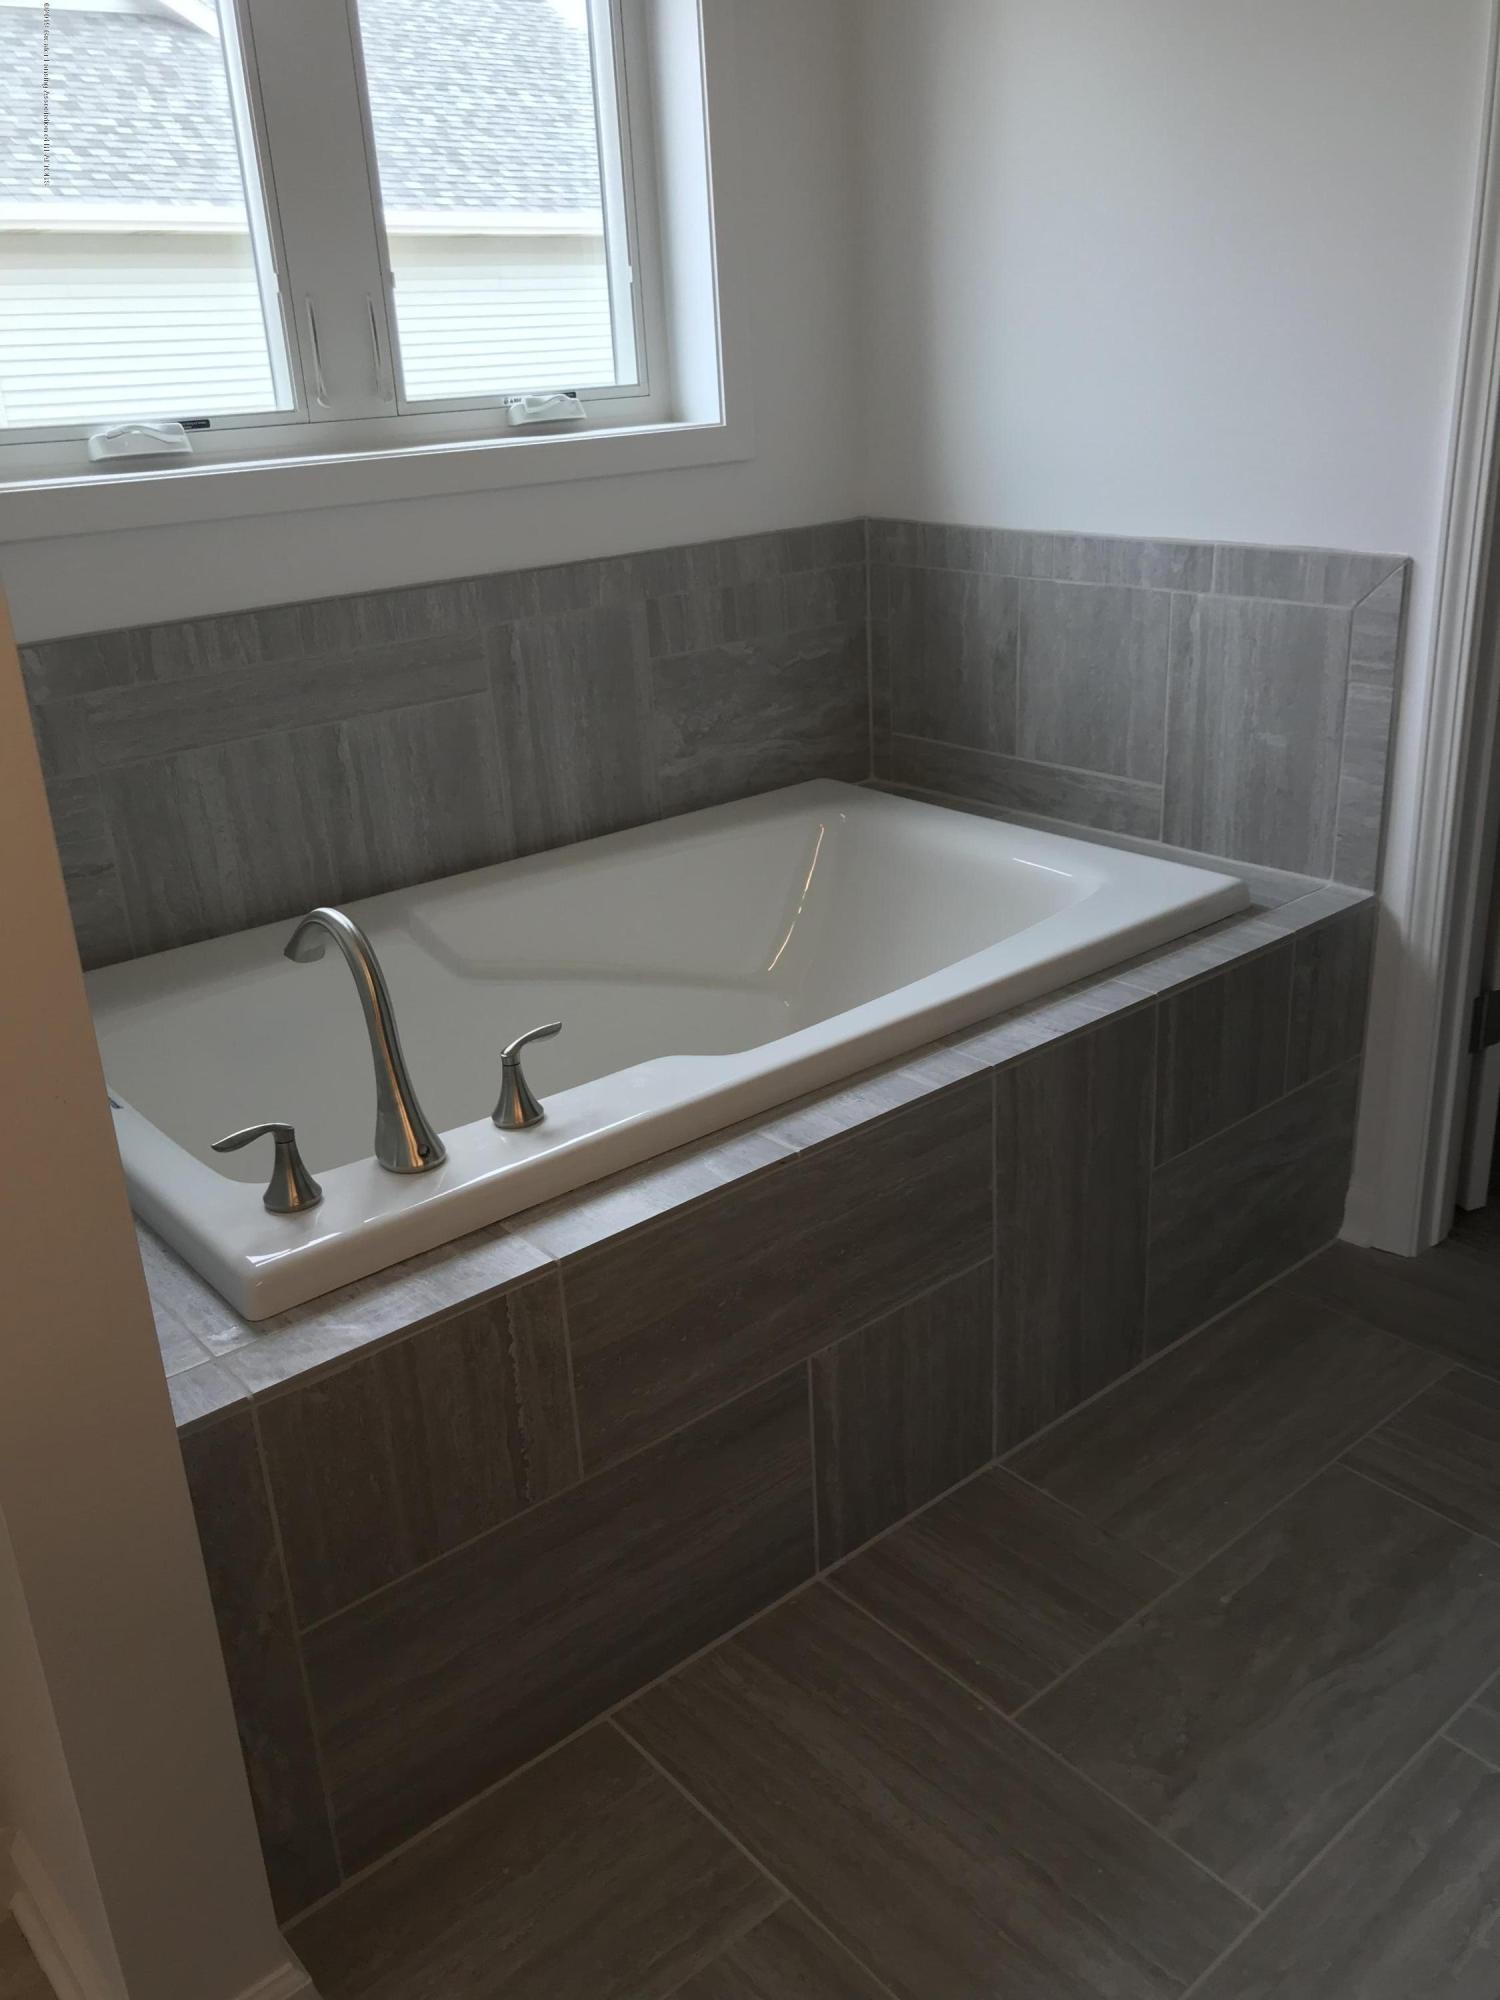 1391 Jackson Dr - Bathroom - 14